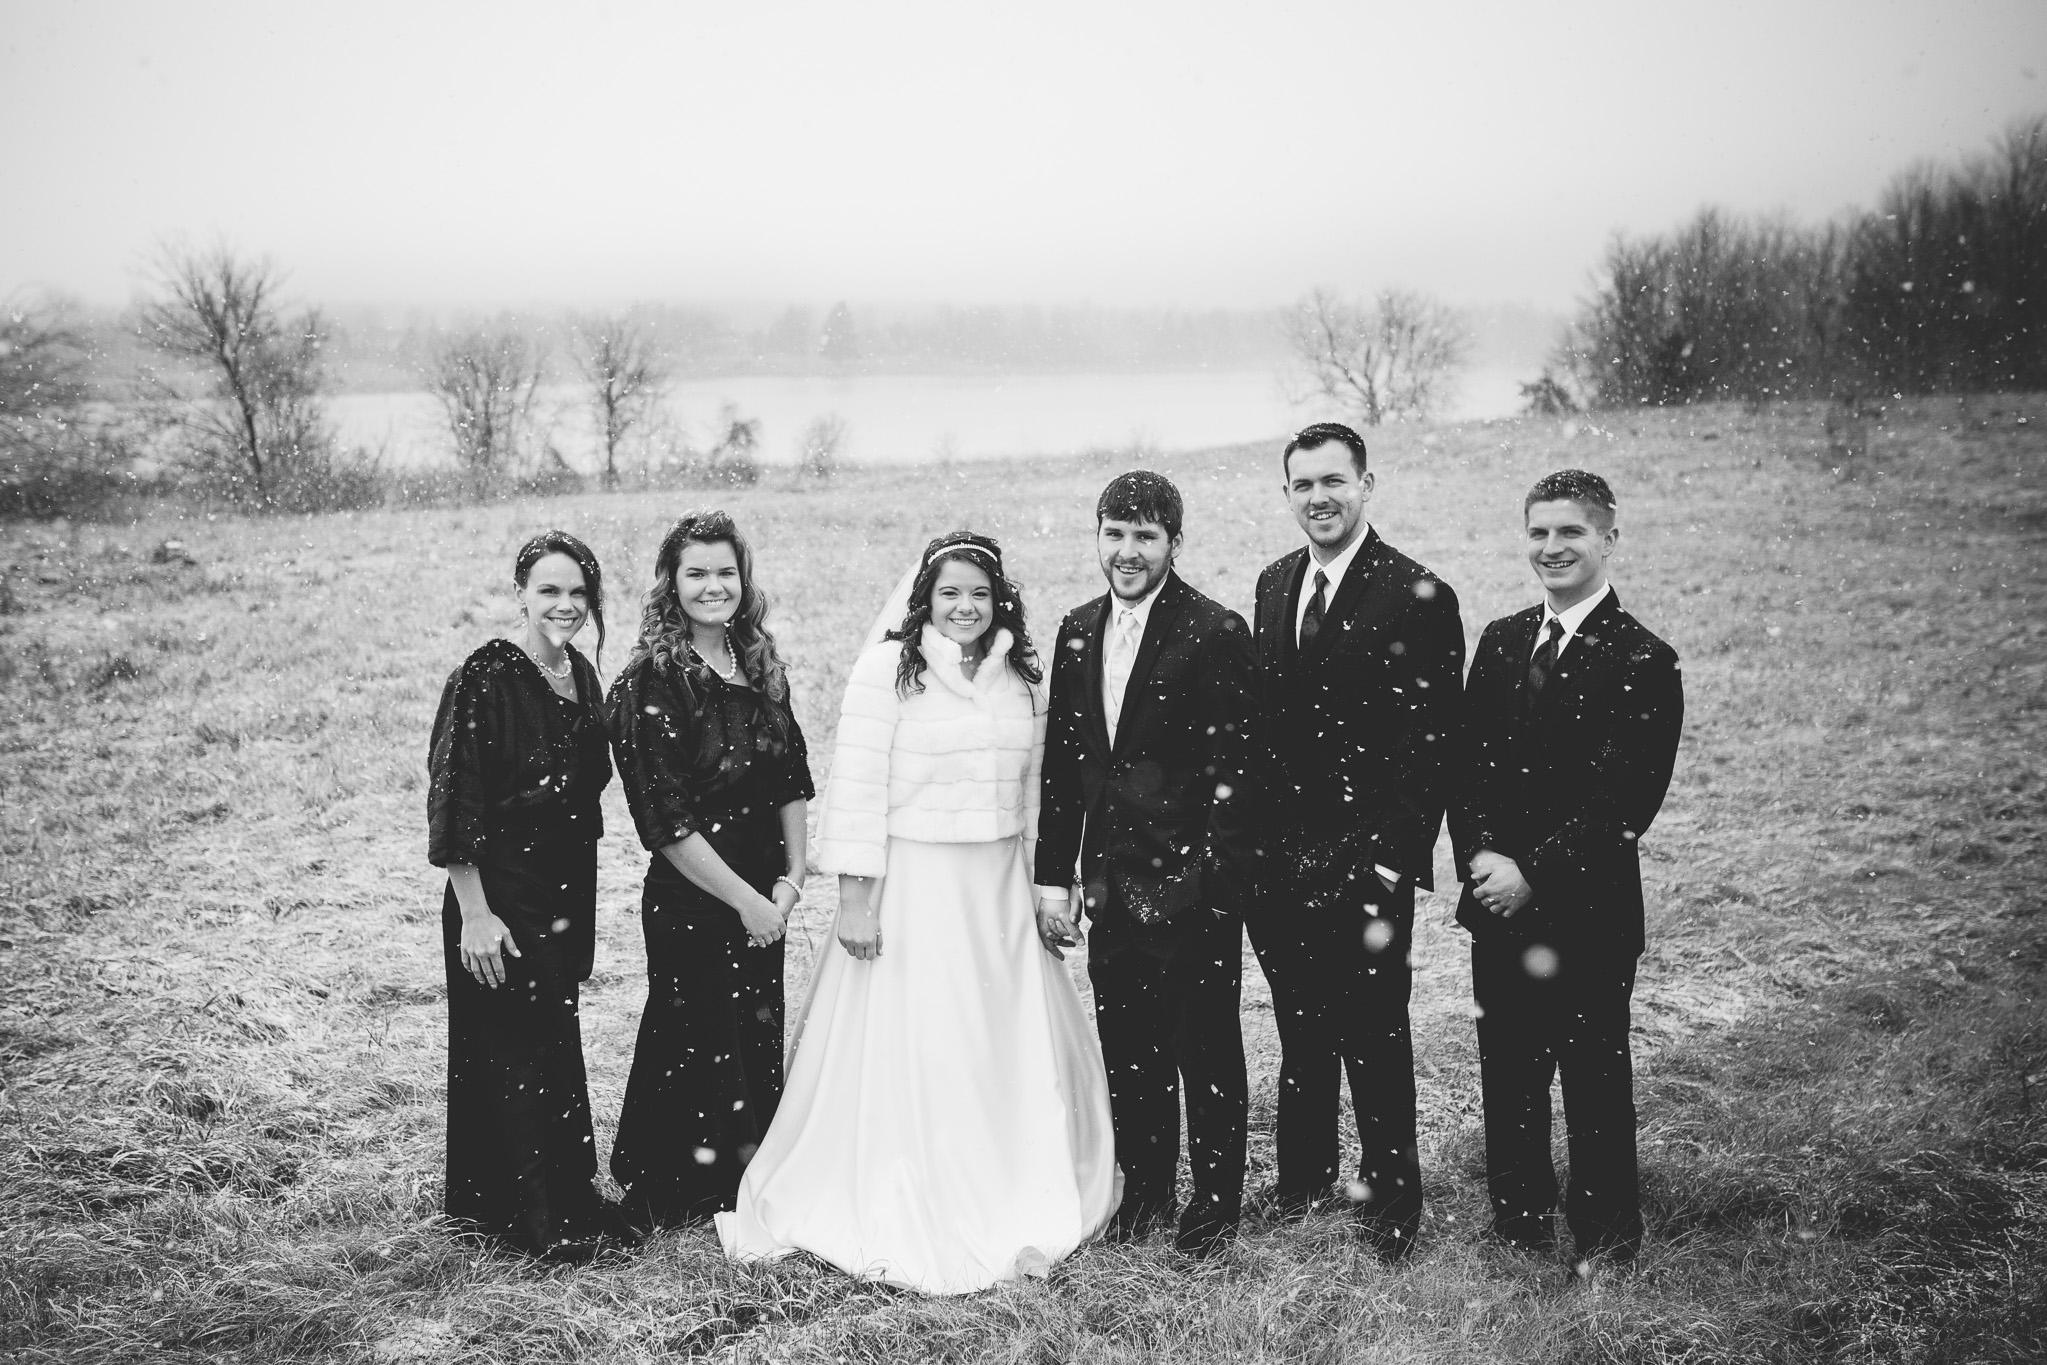 086-Jonathan-Kuhn-Photography-Victoria-Brandon-Wedding-WEB-0465.jpg